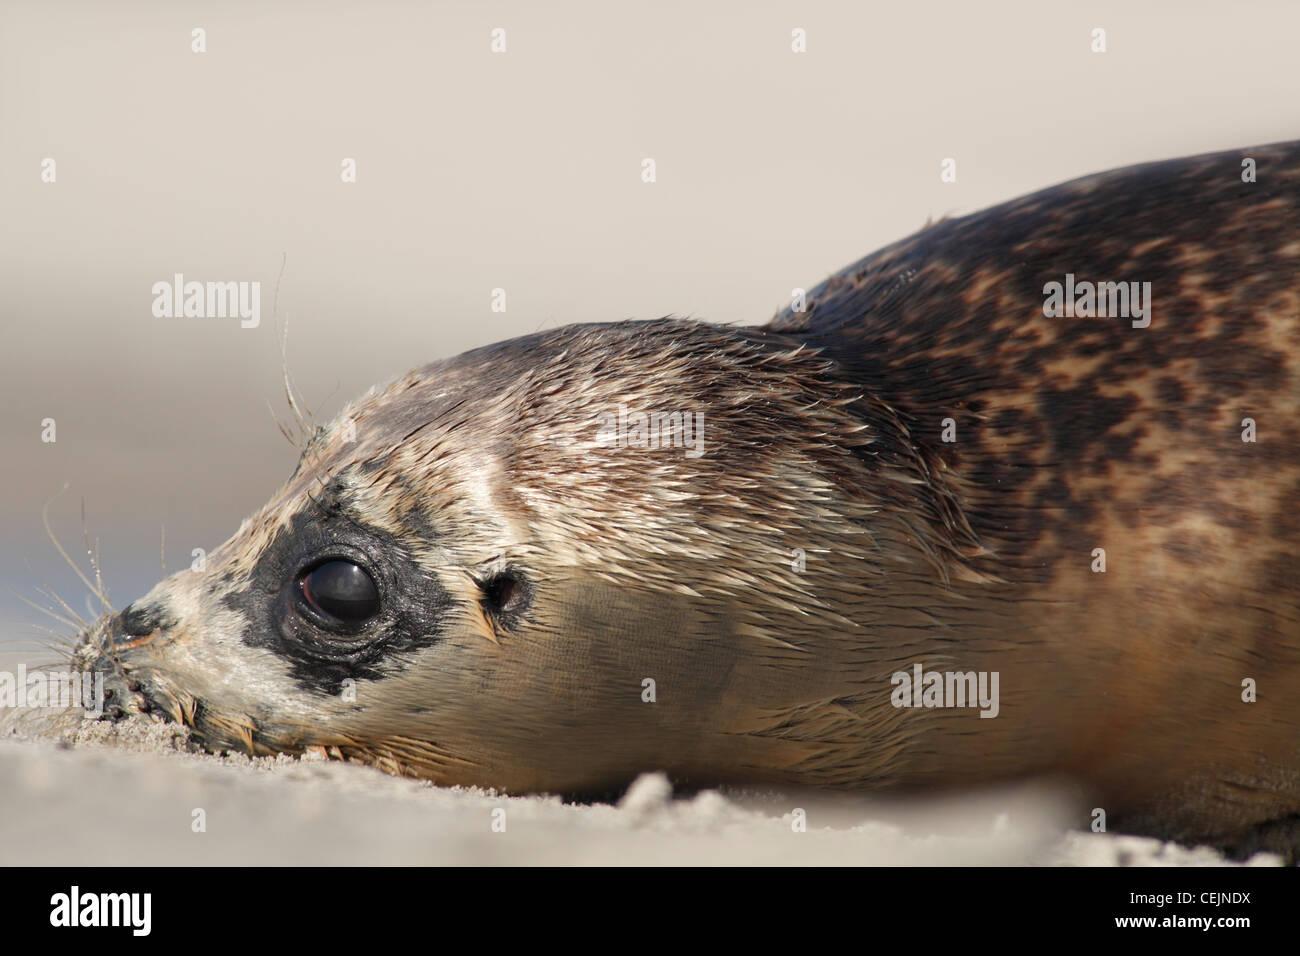 Seehunde; Latein: Phoca Vitulina; Hafen Dichtung, juvenile Hafen Dichtung;  Junger Seehund Stockbild